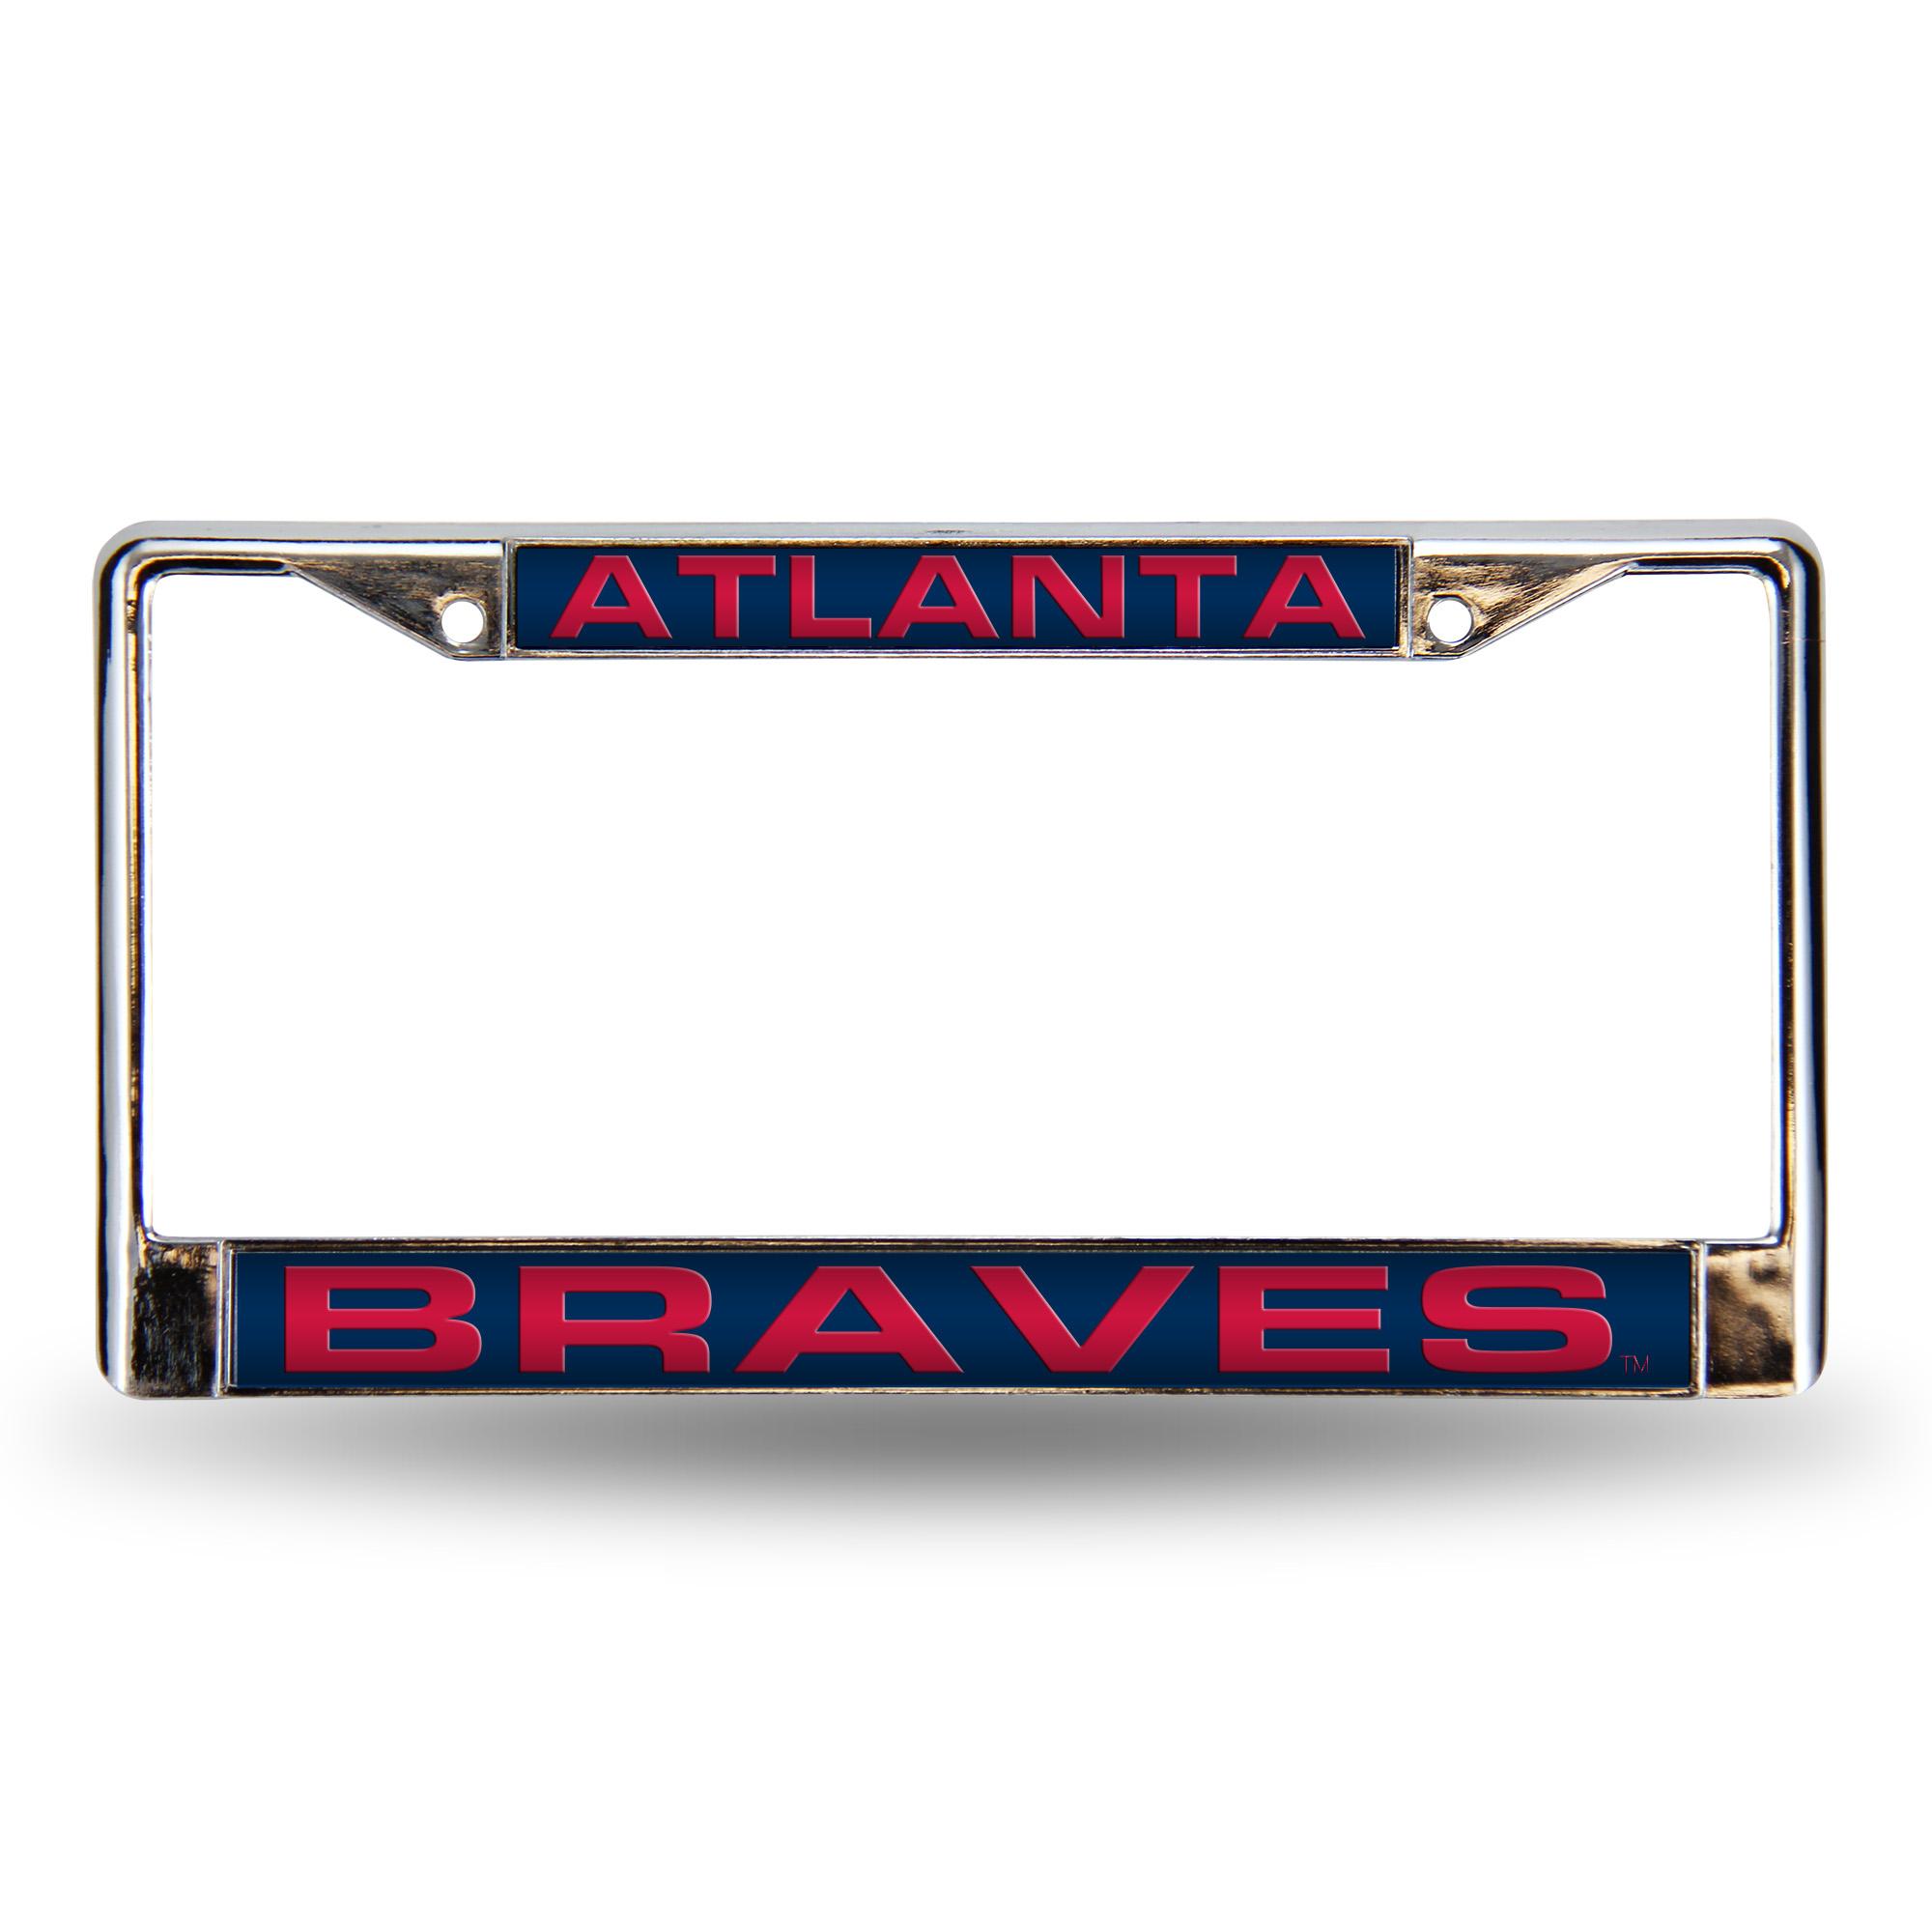 Customize Atlanta Braves License Plate Frames by Auto Plates